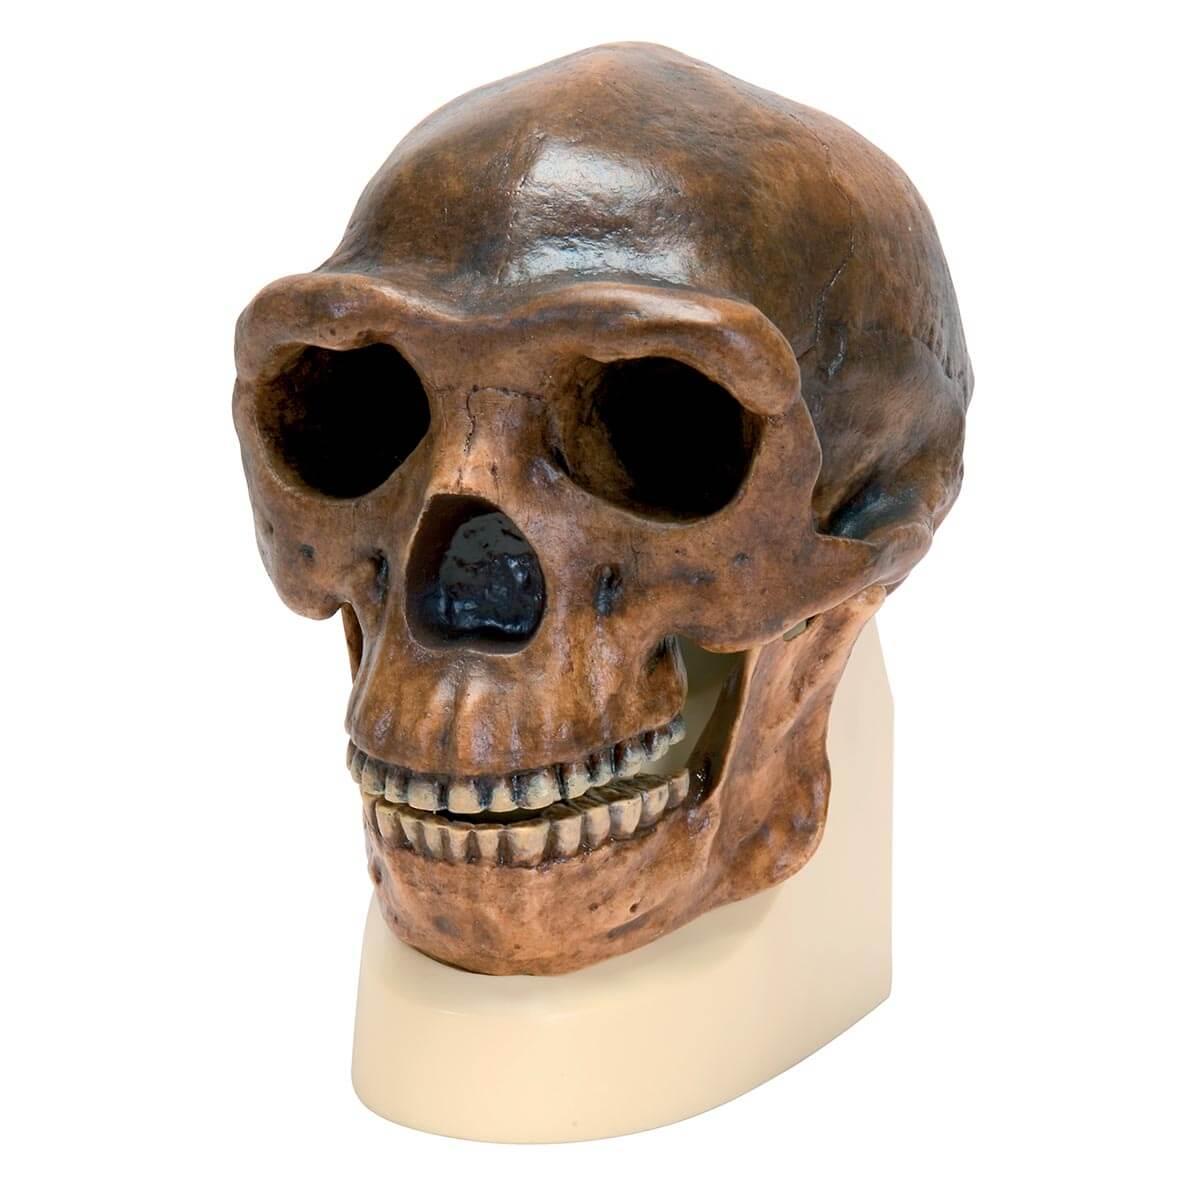 Rêplica de Crânio Homo Erectus Pekinensis (weidenreich, 1940)